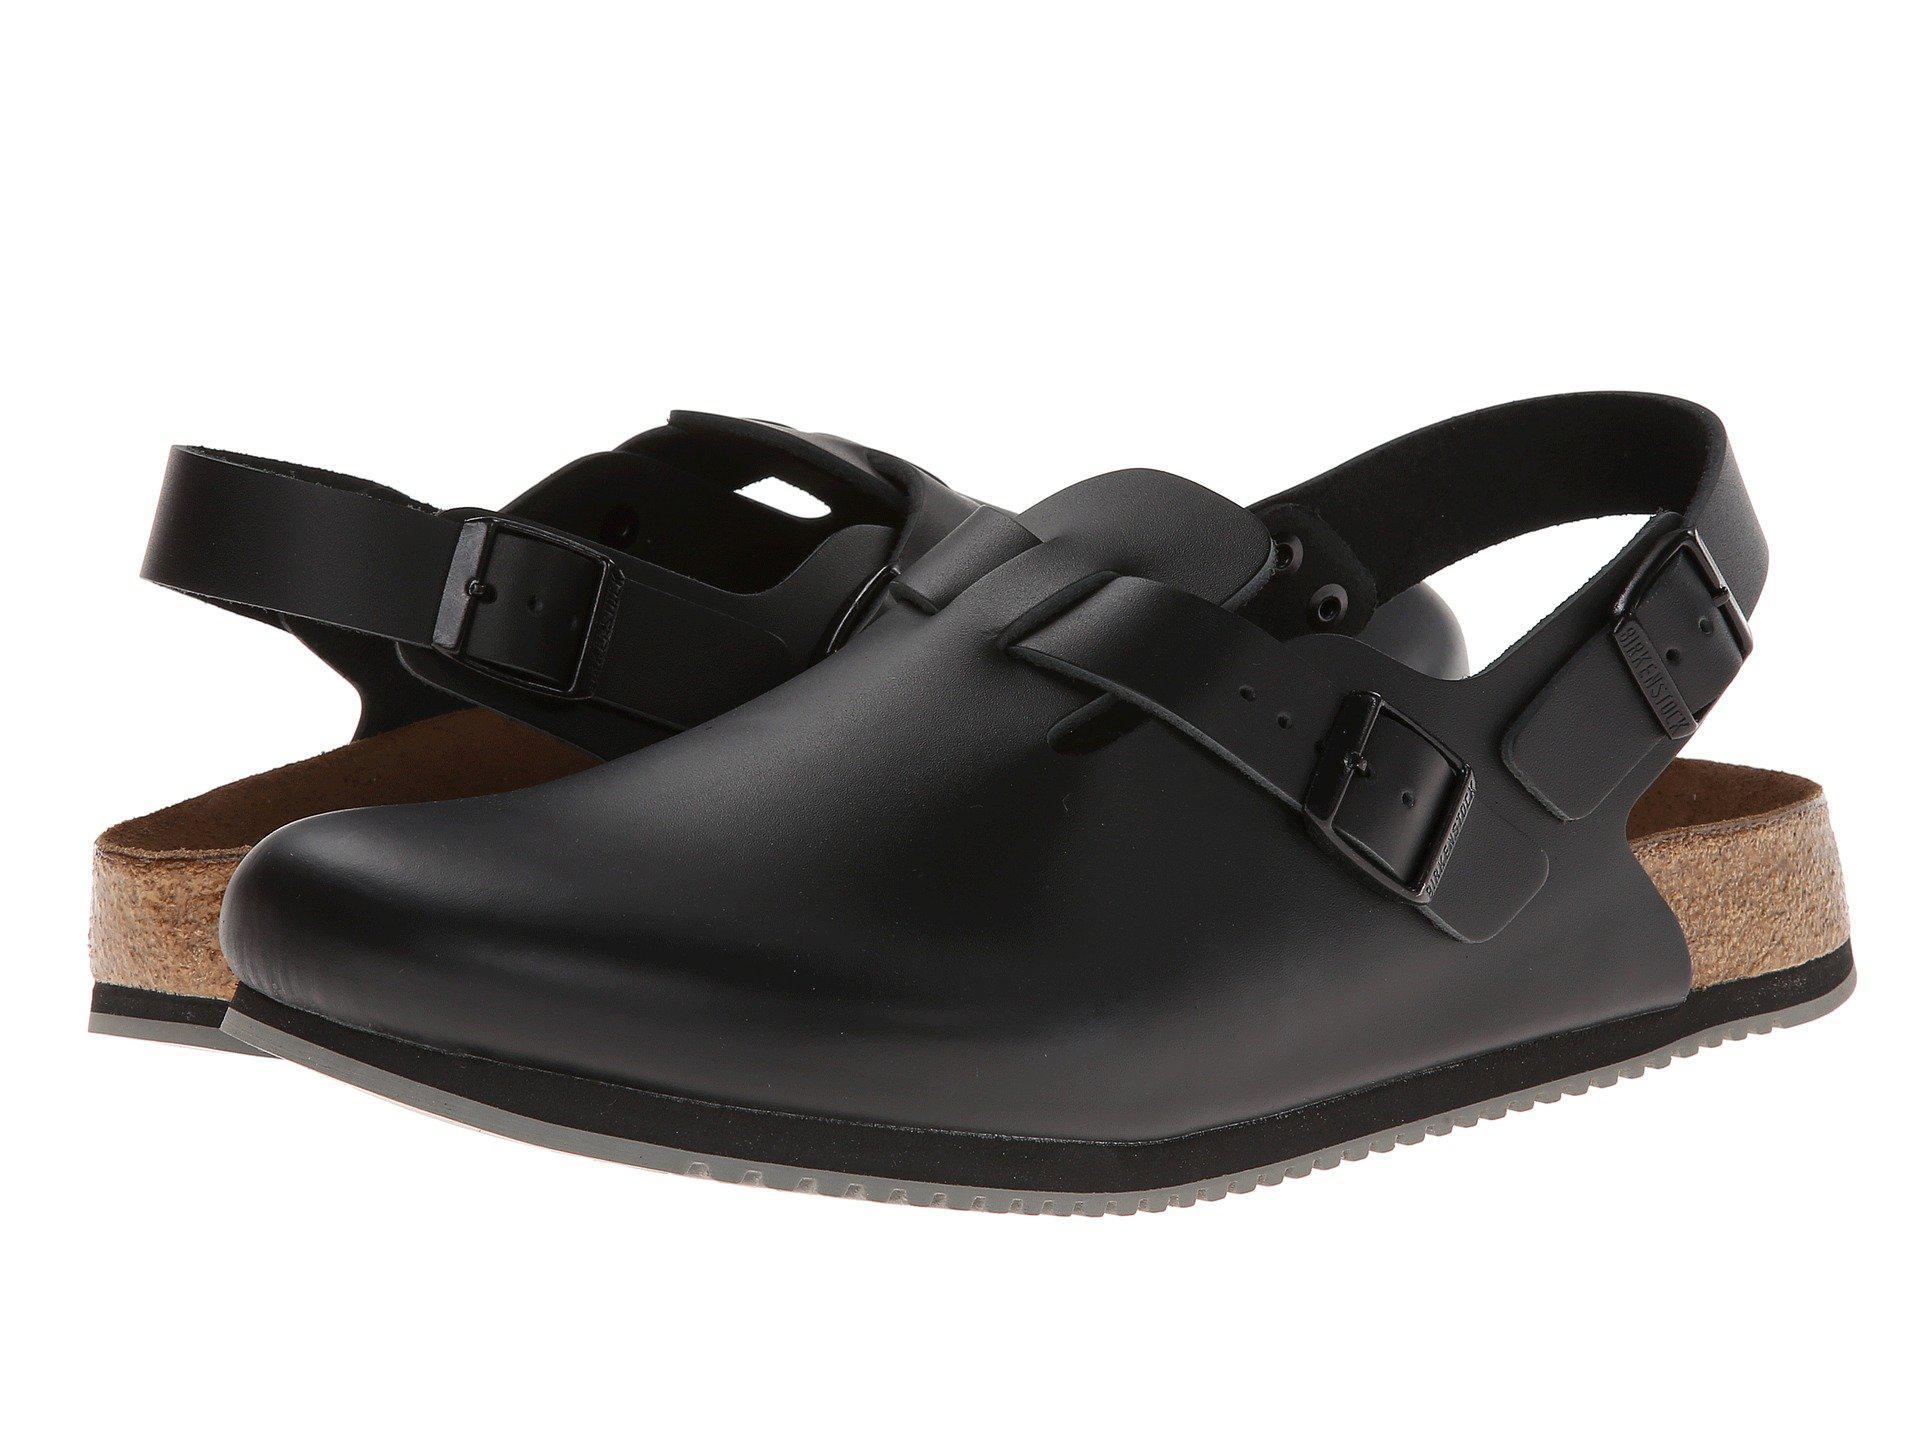 57f92145a1e Birkenstock - Black Tokyo Super Grip (white Leather) Shoes - Lyst. View  fullscreen